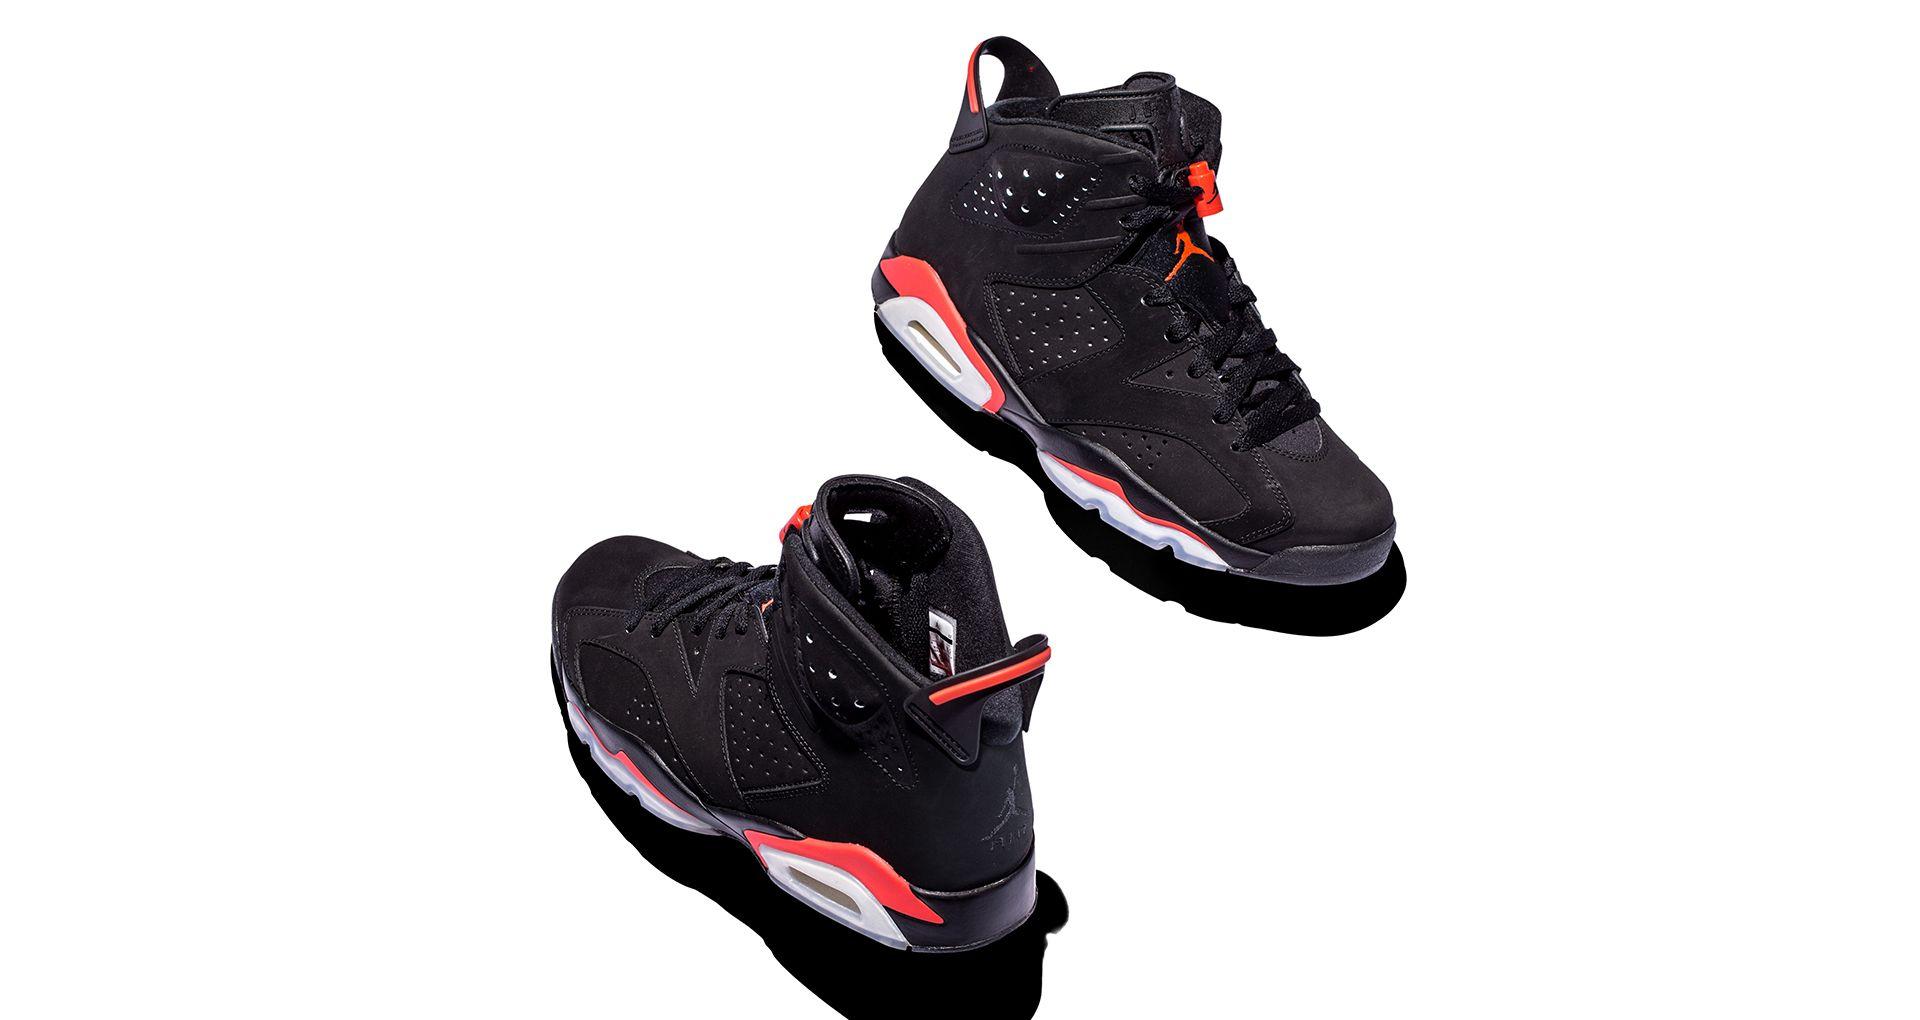 227ea586a62eed Inside the Vault  Air Jordan 6 Evolution. Nike+ SNKRS